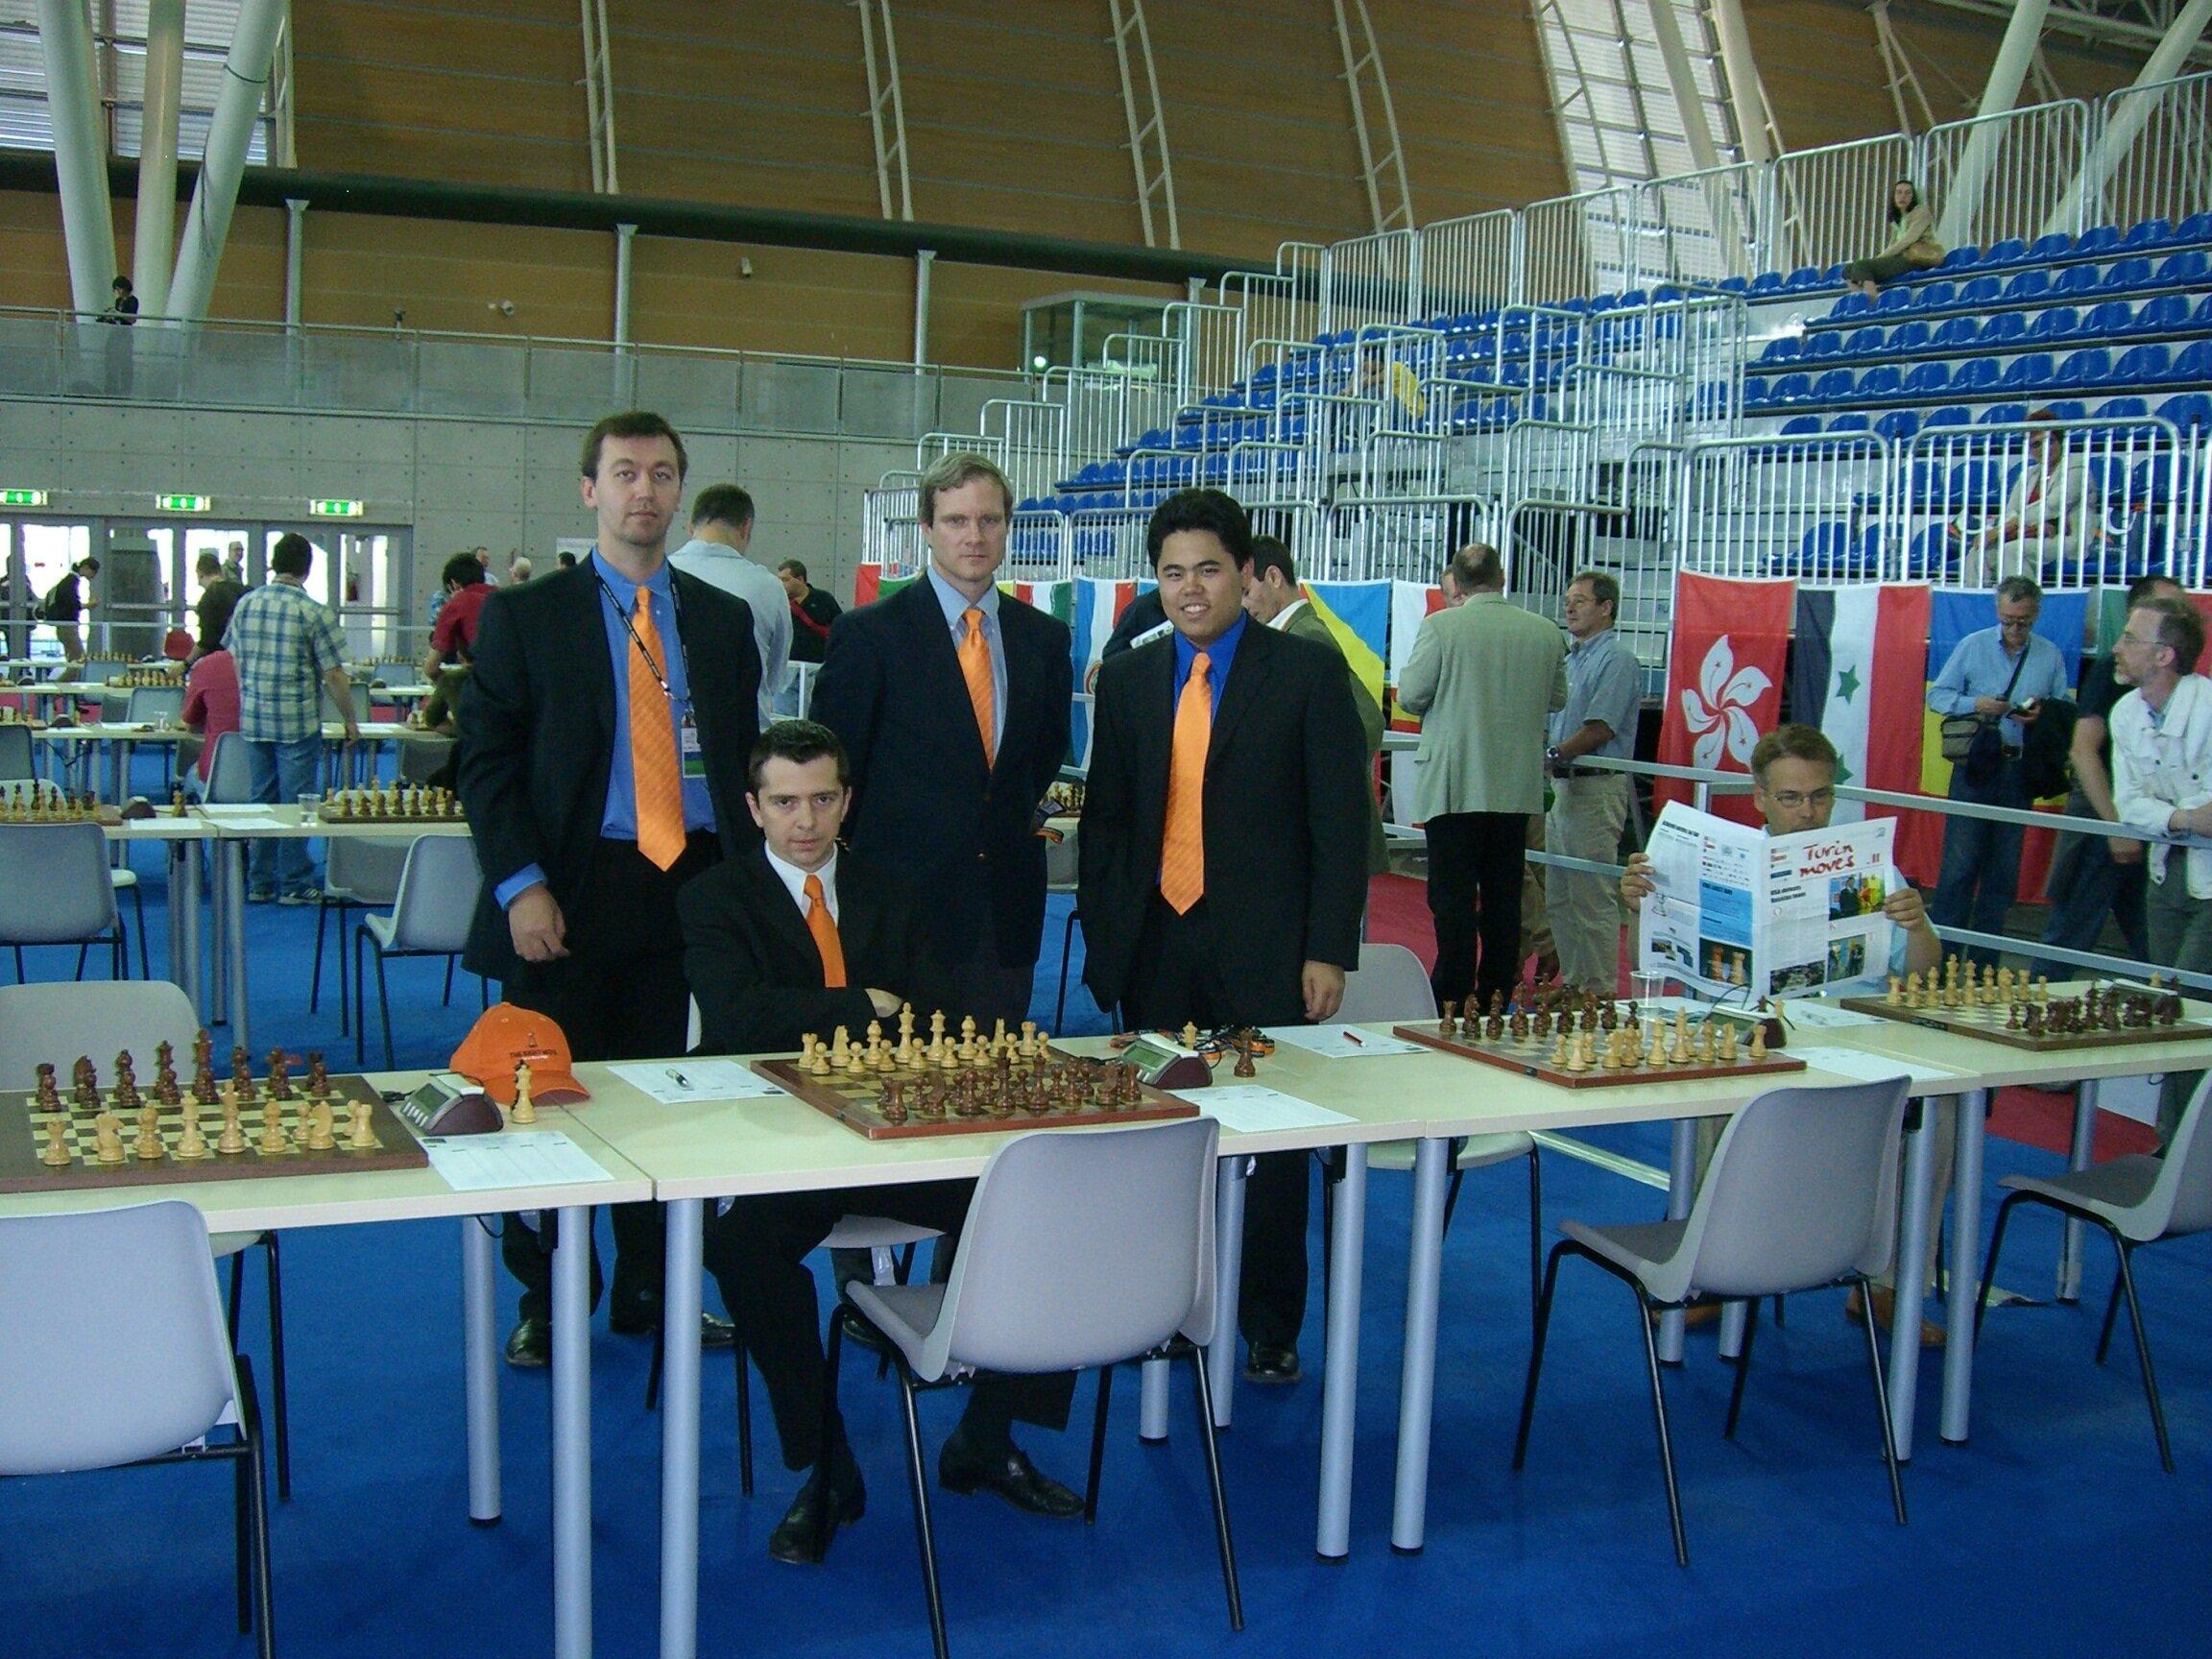 John Donaldson (center) at the 2006 Olympiad in Turin. (also pictured, Gata Kamsky, Alex Onishchuk, Hikaru Nakamura)